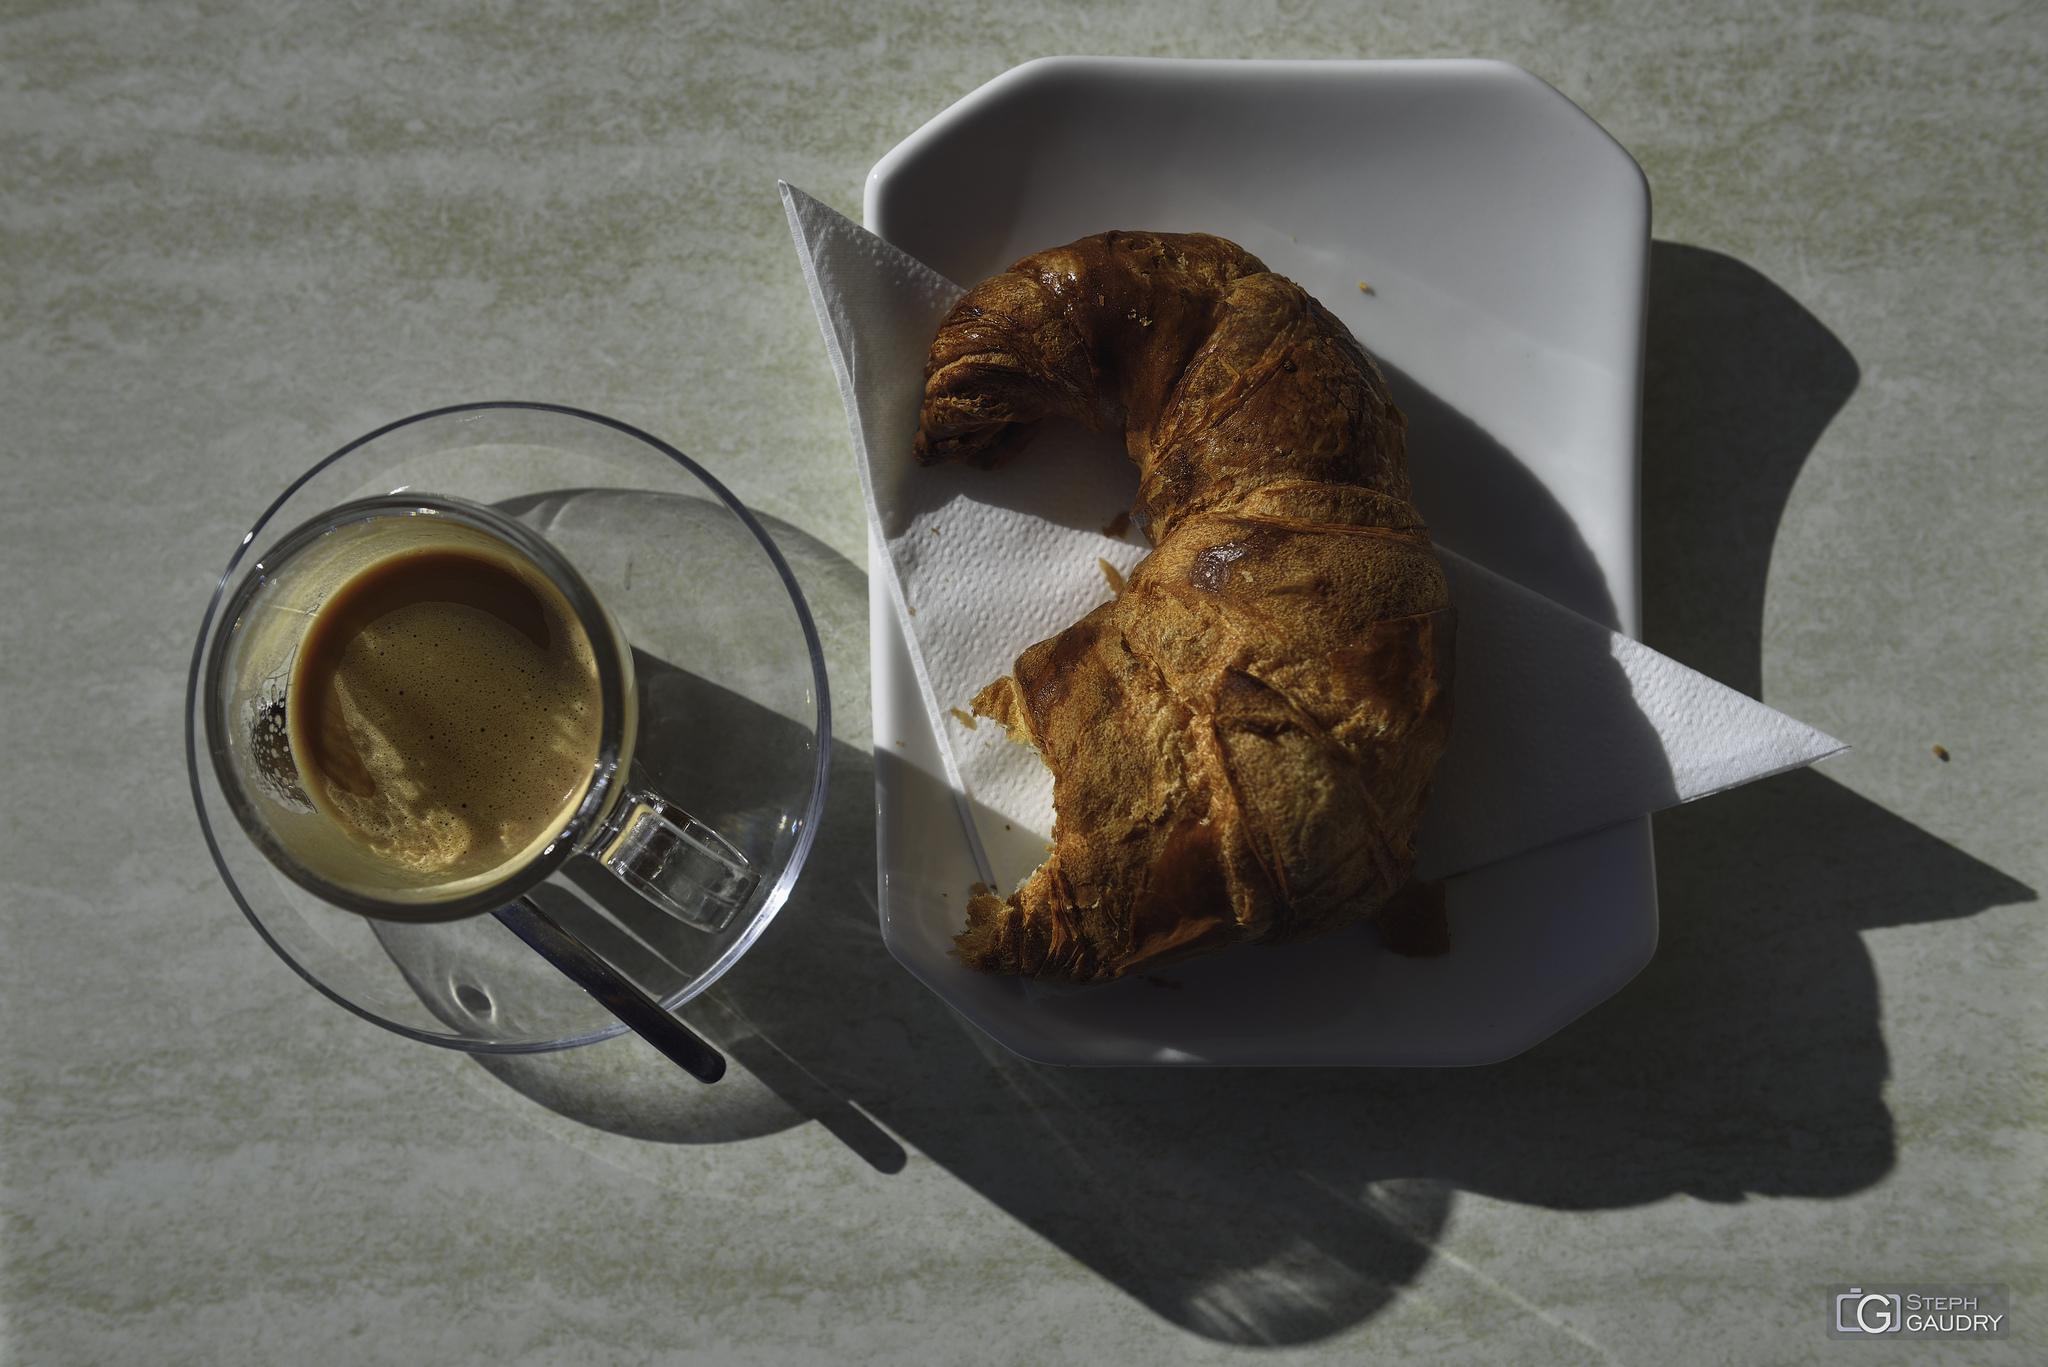 Sunny breakfast [Klik om de diavoorstelling te starten]